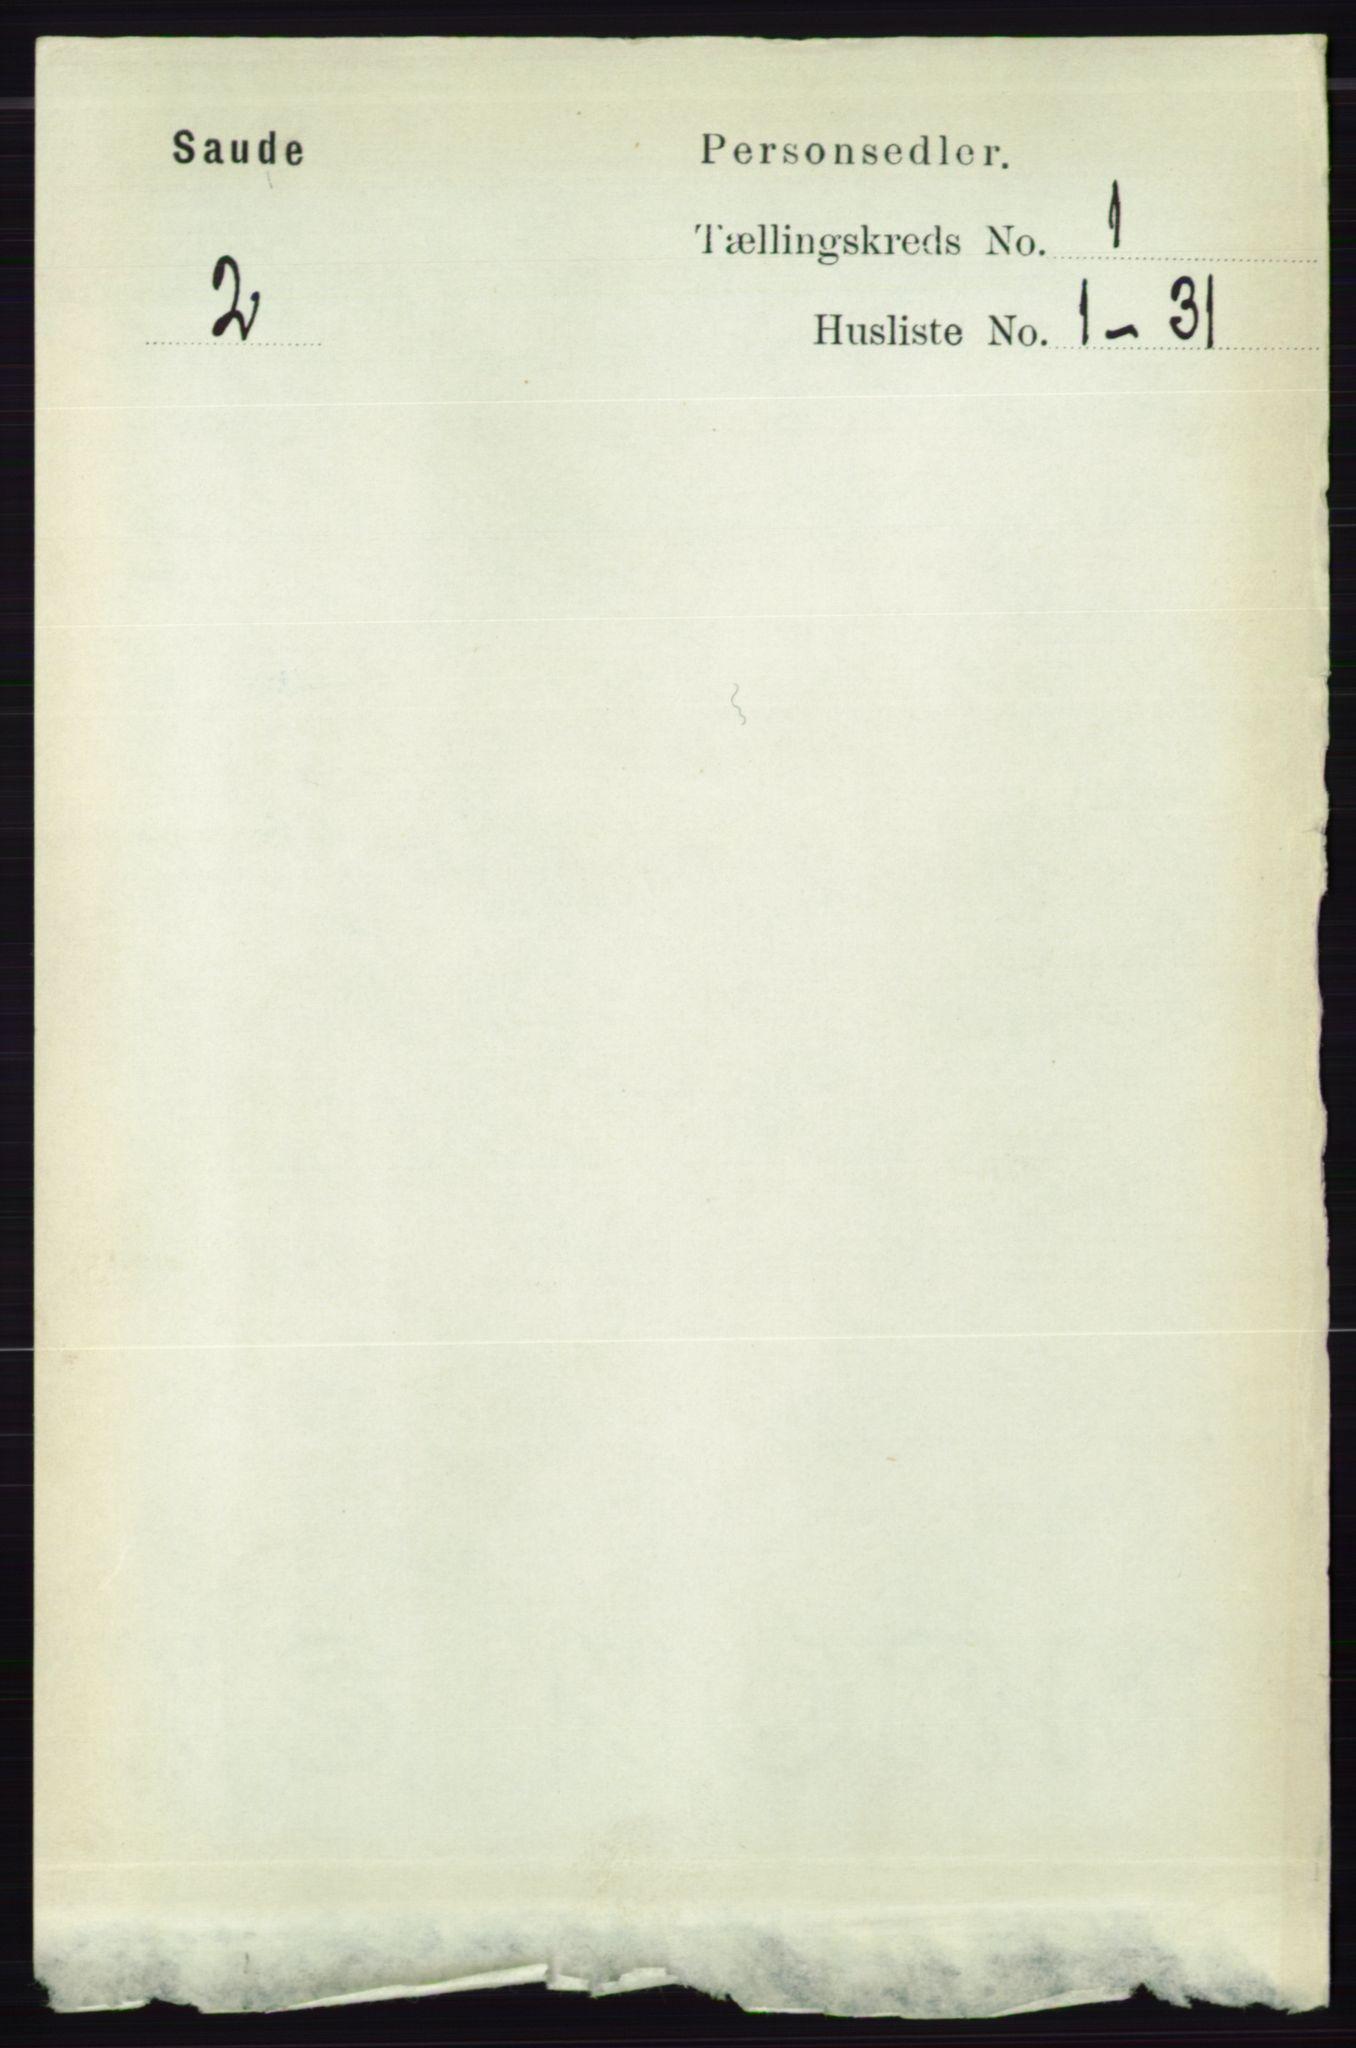 RA, Folketelling 1891 for 0822 Sauherad herred, 1891, s. 99